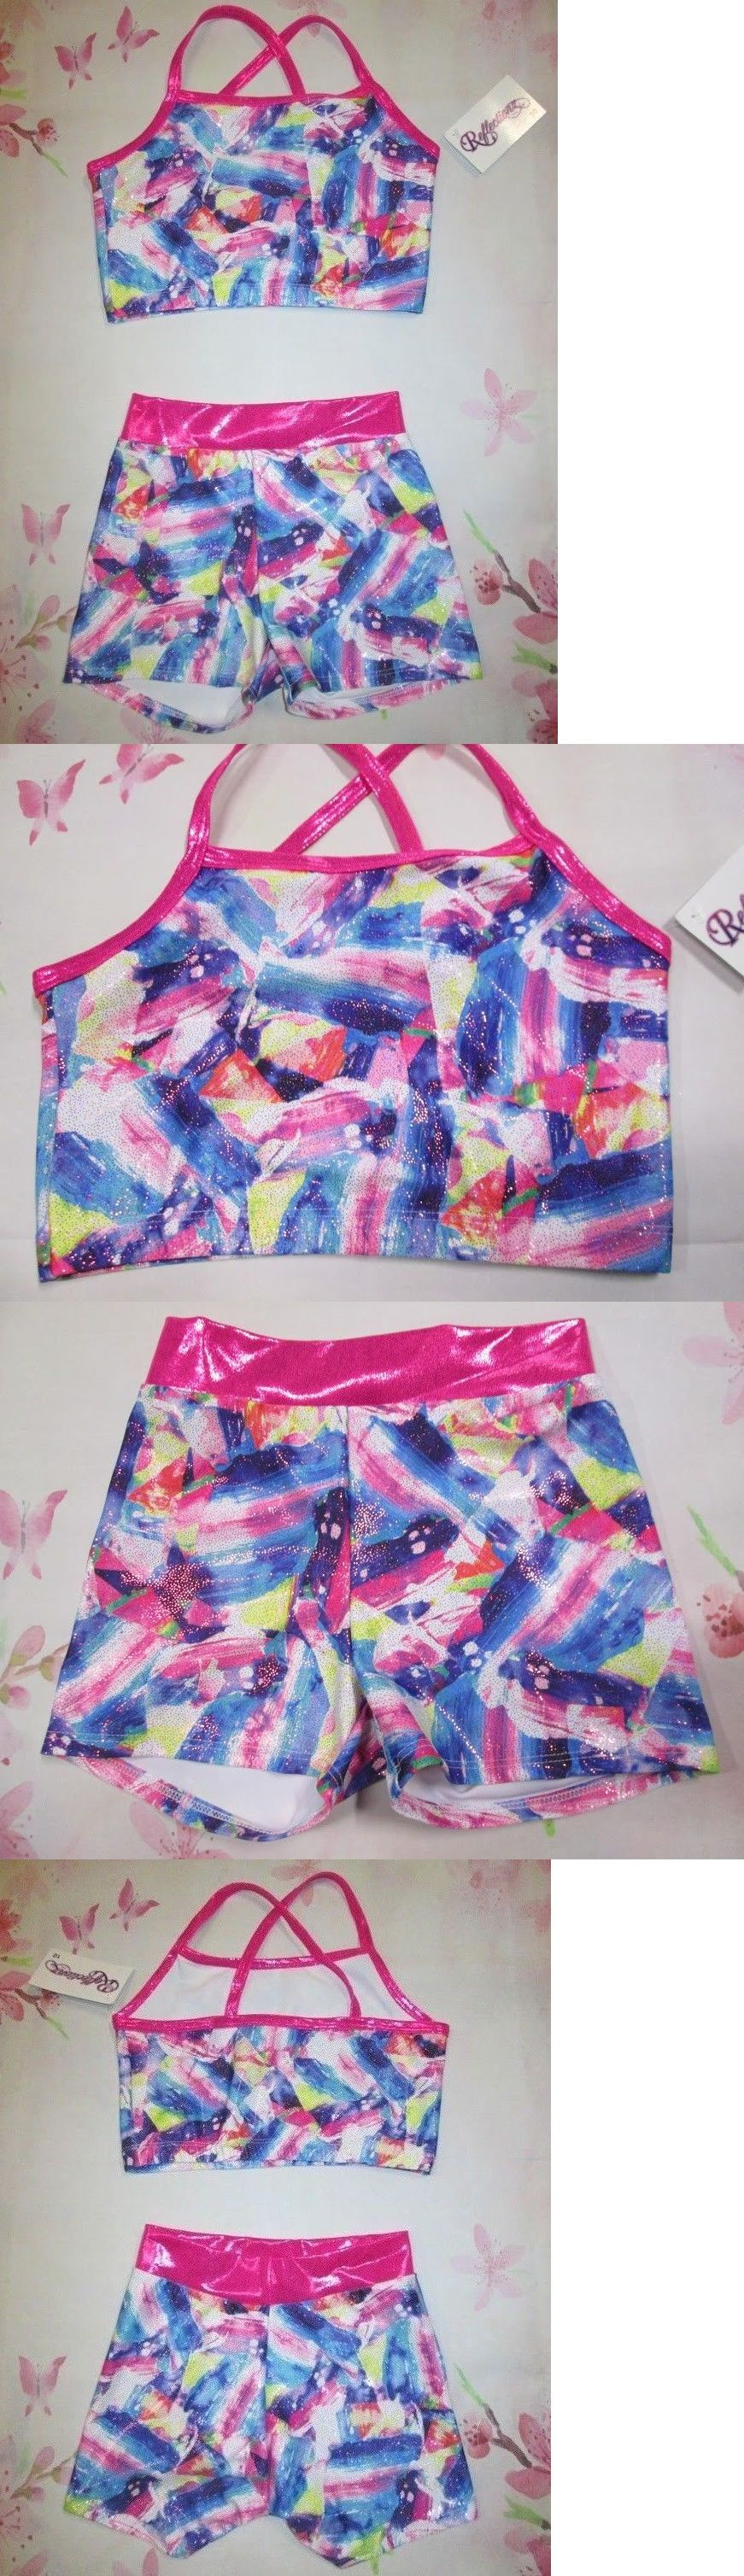 New Girls XS 4 SC Crop Bra Top Shorts Set Lot Dance Gymnastics Cheer Purple